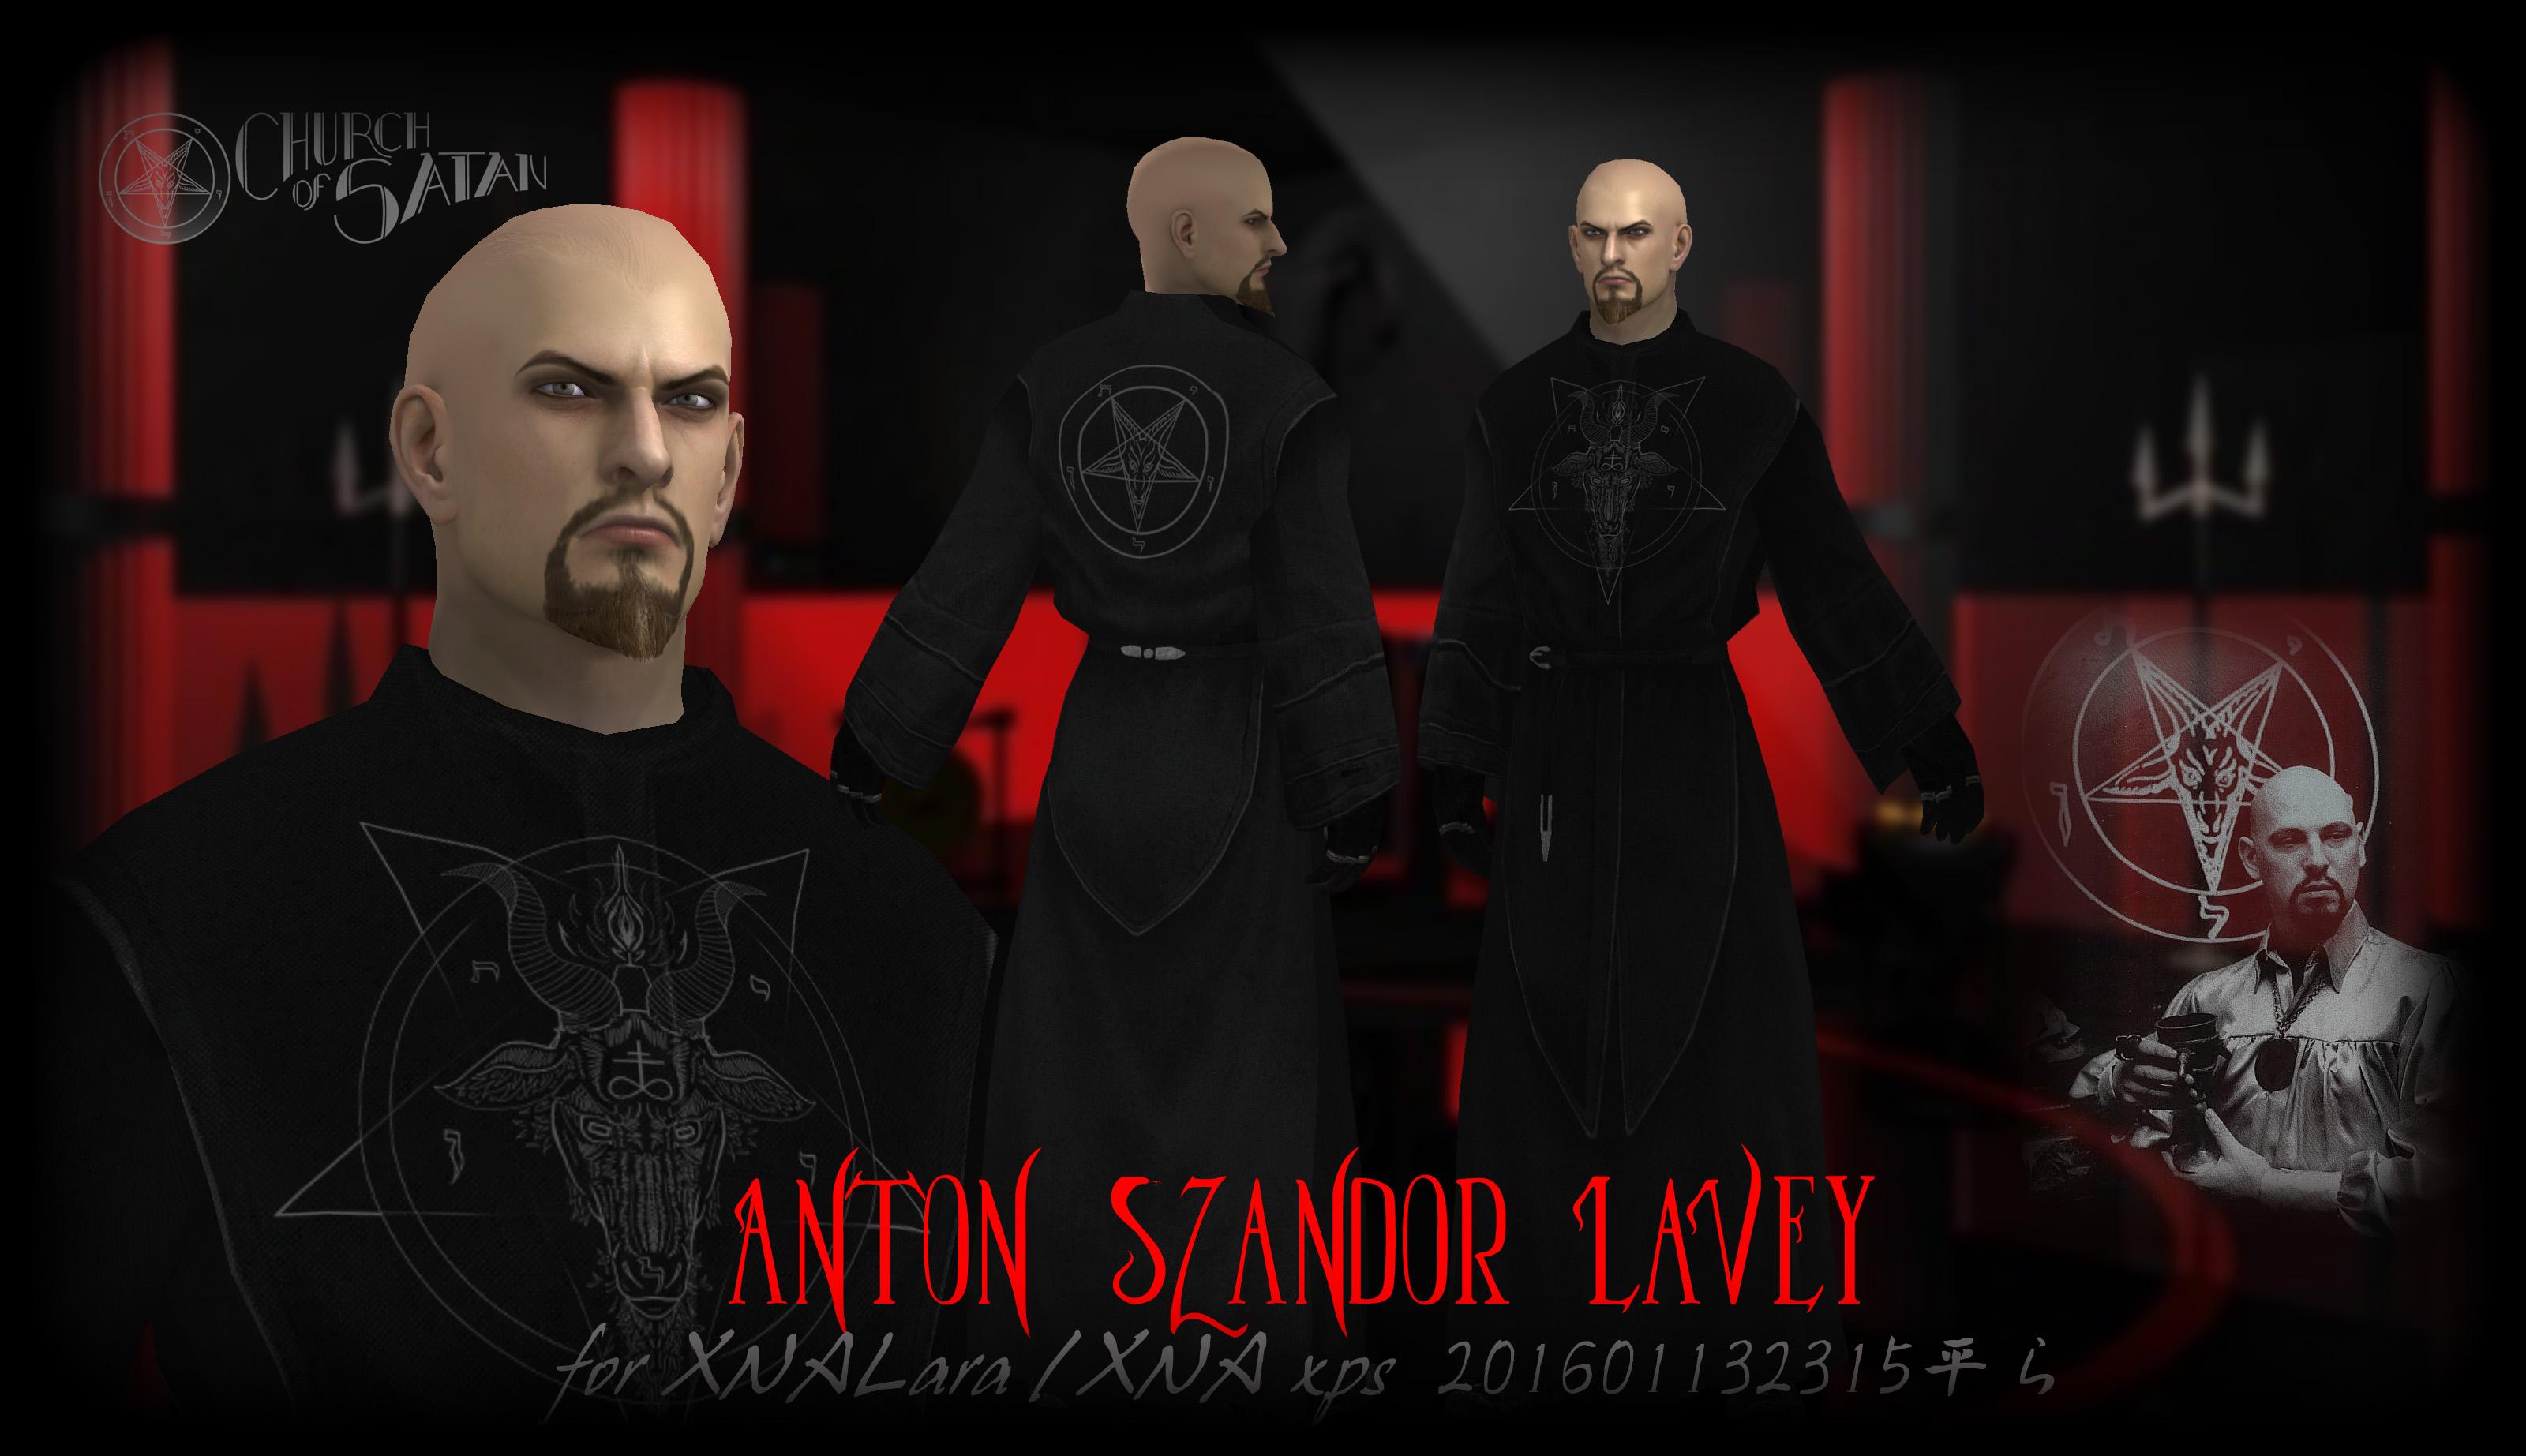 Anton Szandor LaVey7788  scribdcom